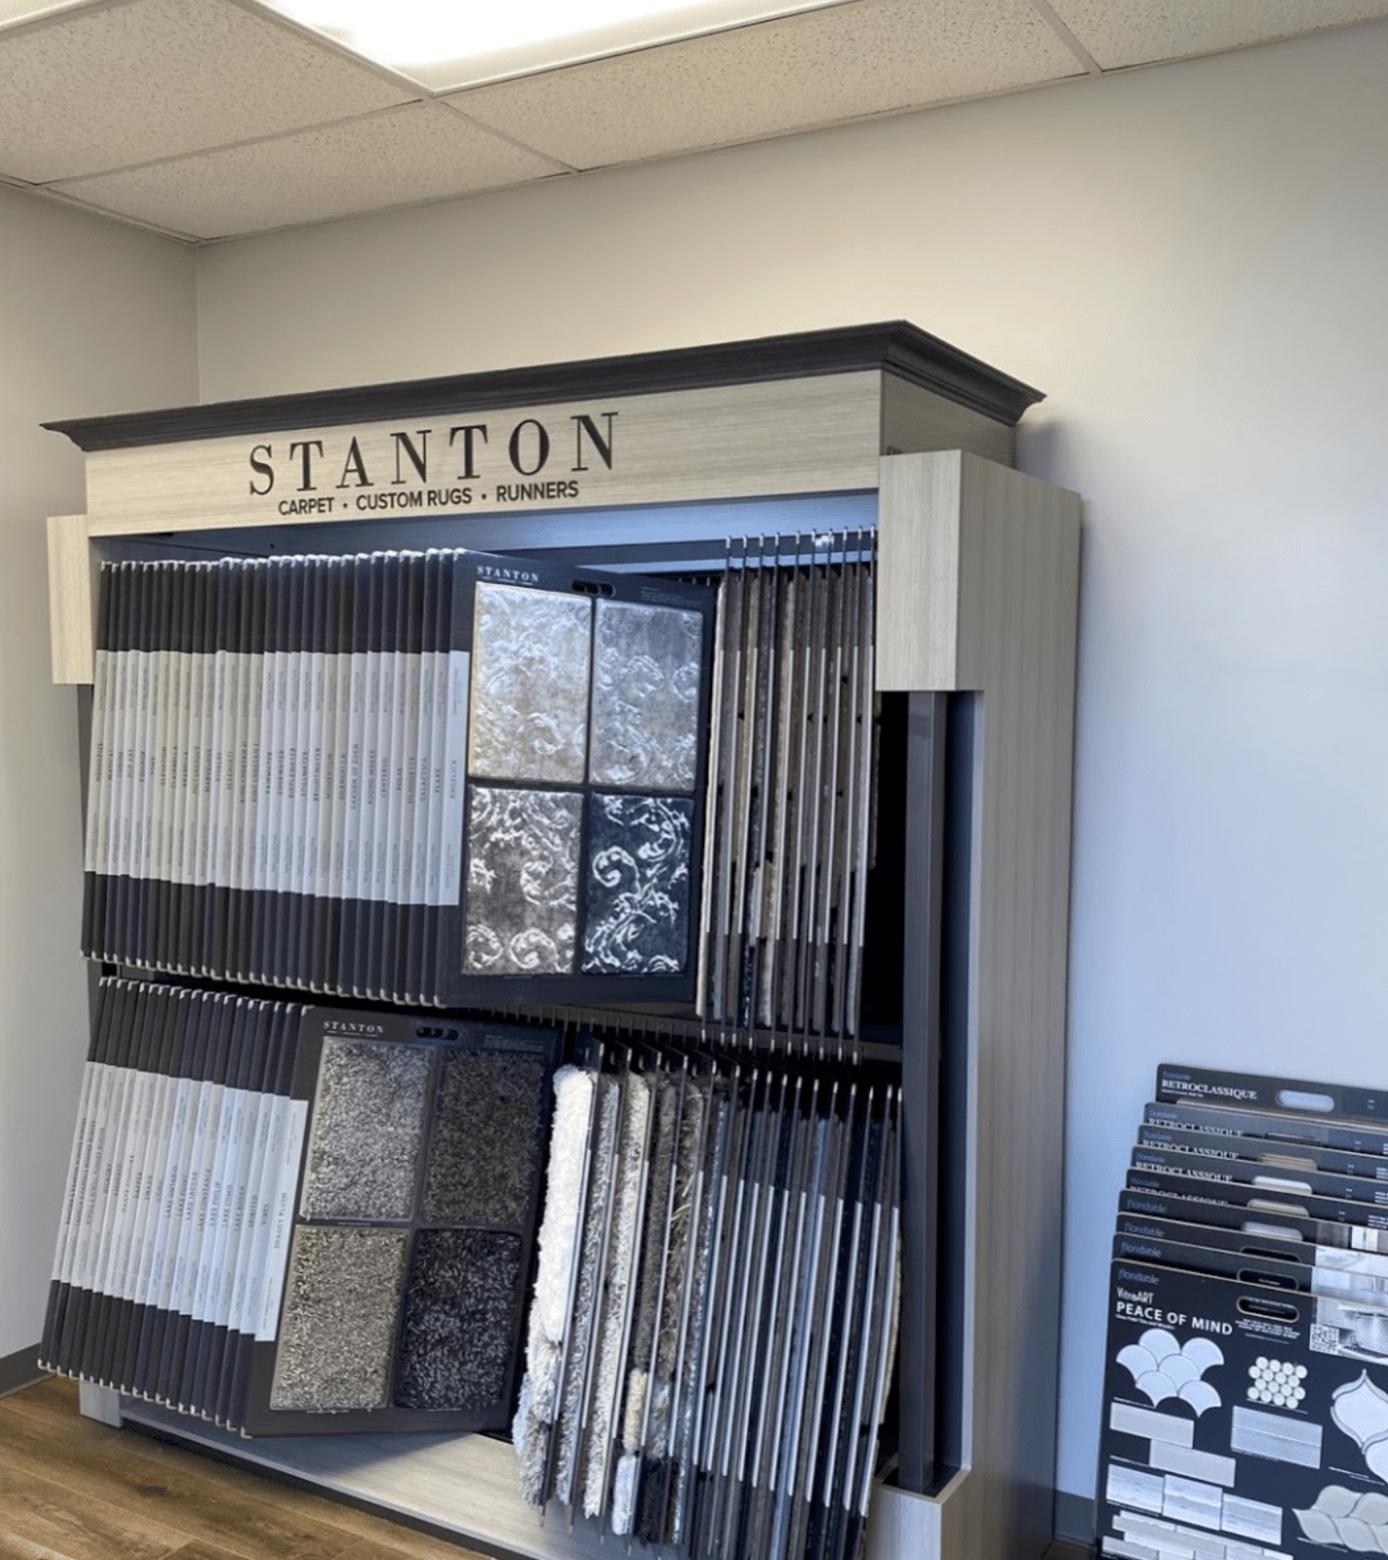 Stanton carpet for your Braselton, GA home from White Oak Flooring and Design